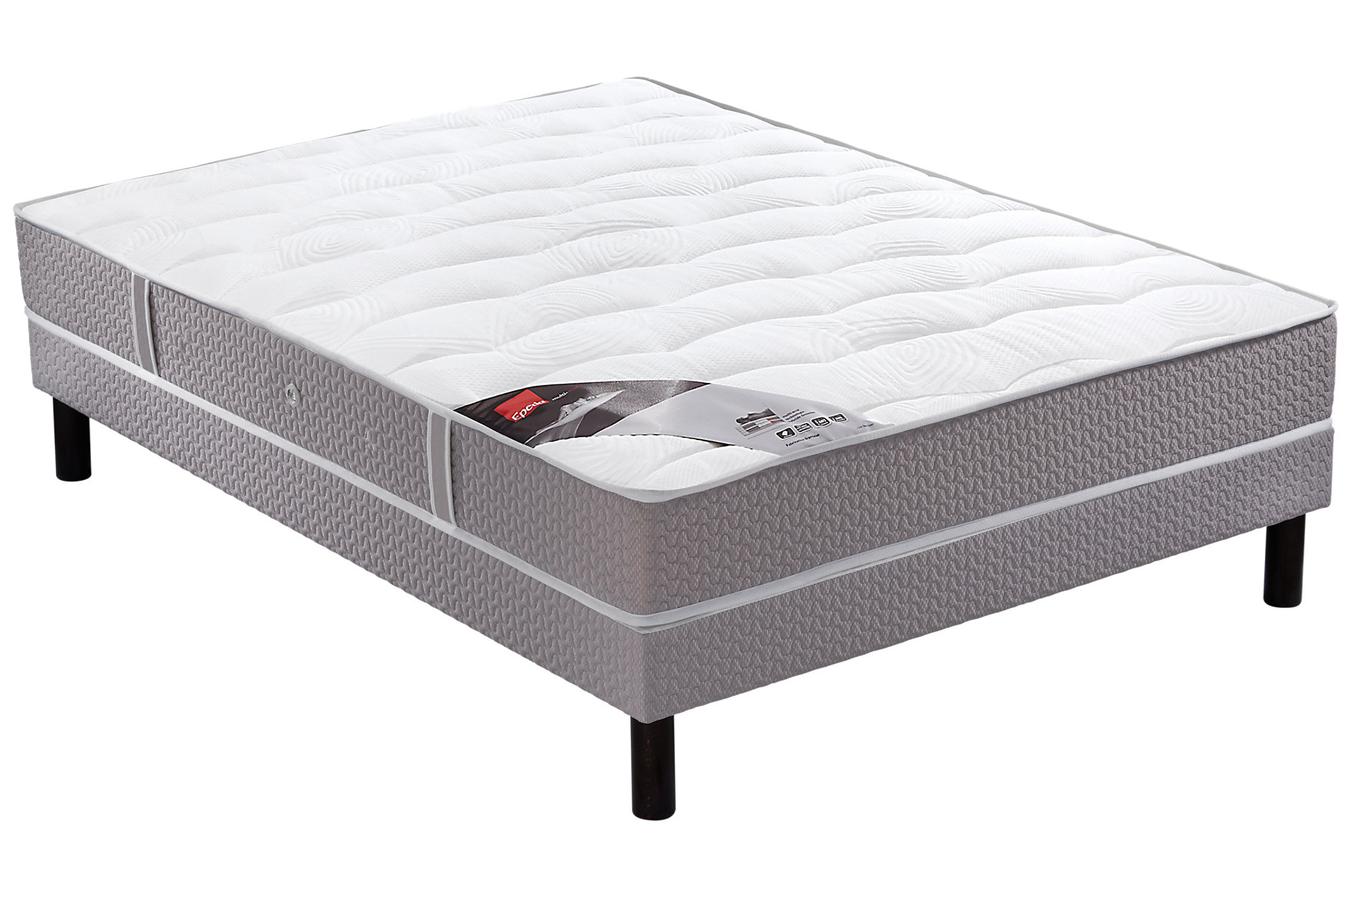 matelas epeda mandore ii 160x200cm 4102720 darty. Black Bedroom Furniture Sets. Home Design Ideas